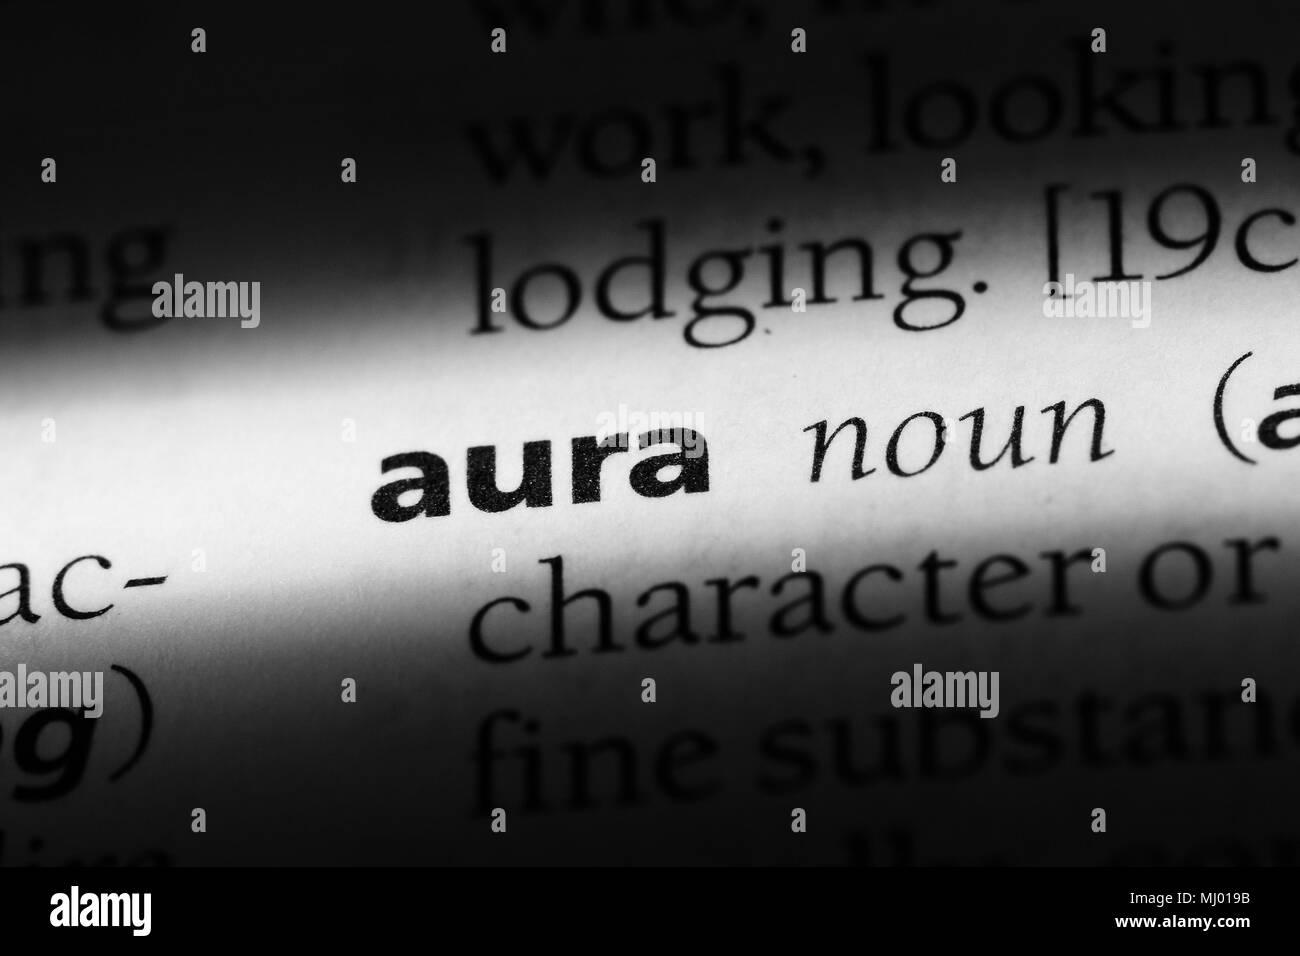 Aura Black and White Stock Photos & Images - Alamy